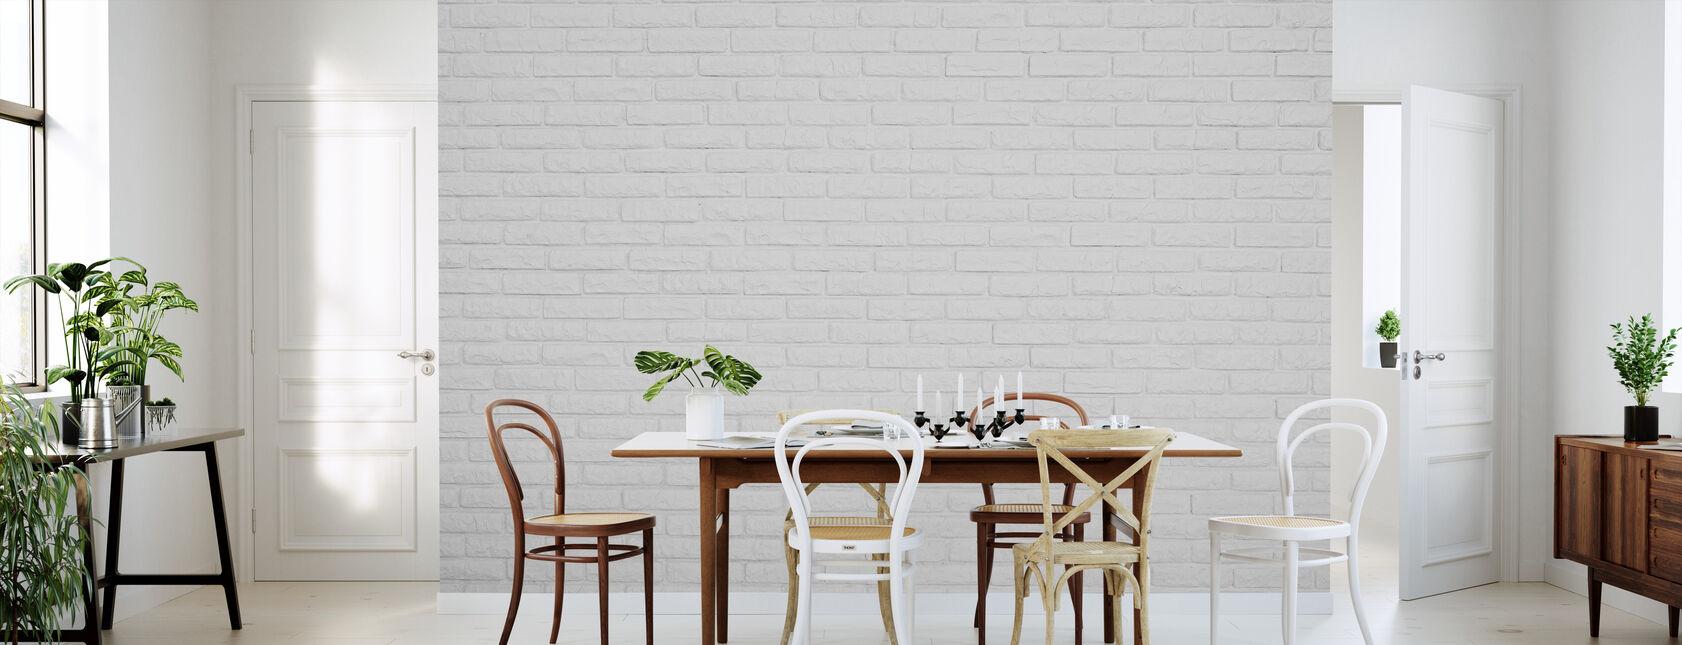 Pared de ladrillo blanco - Papel pintado - Cocina